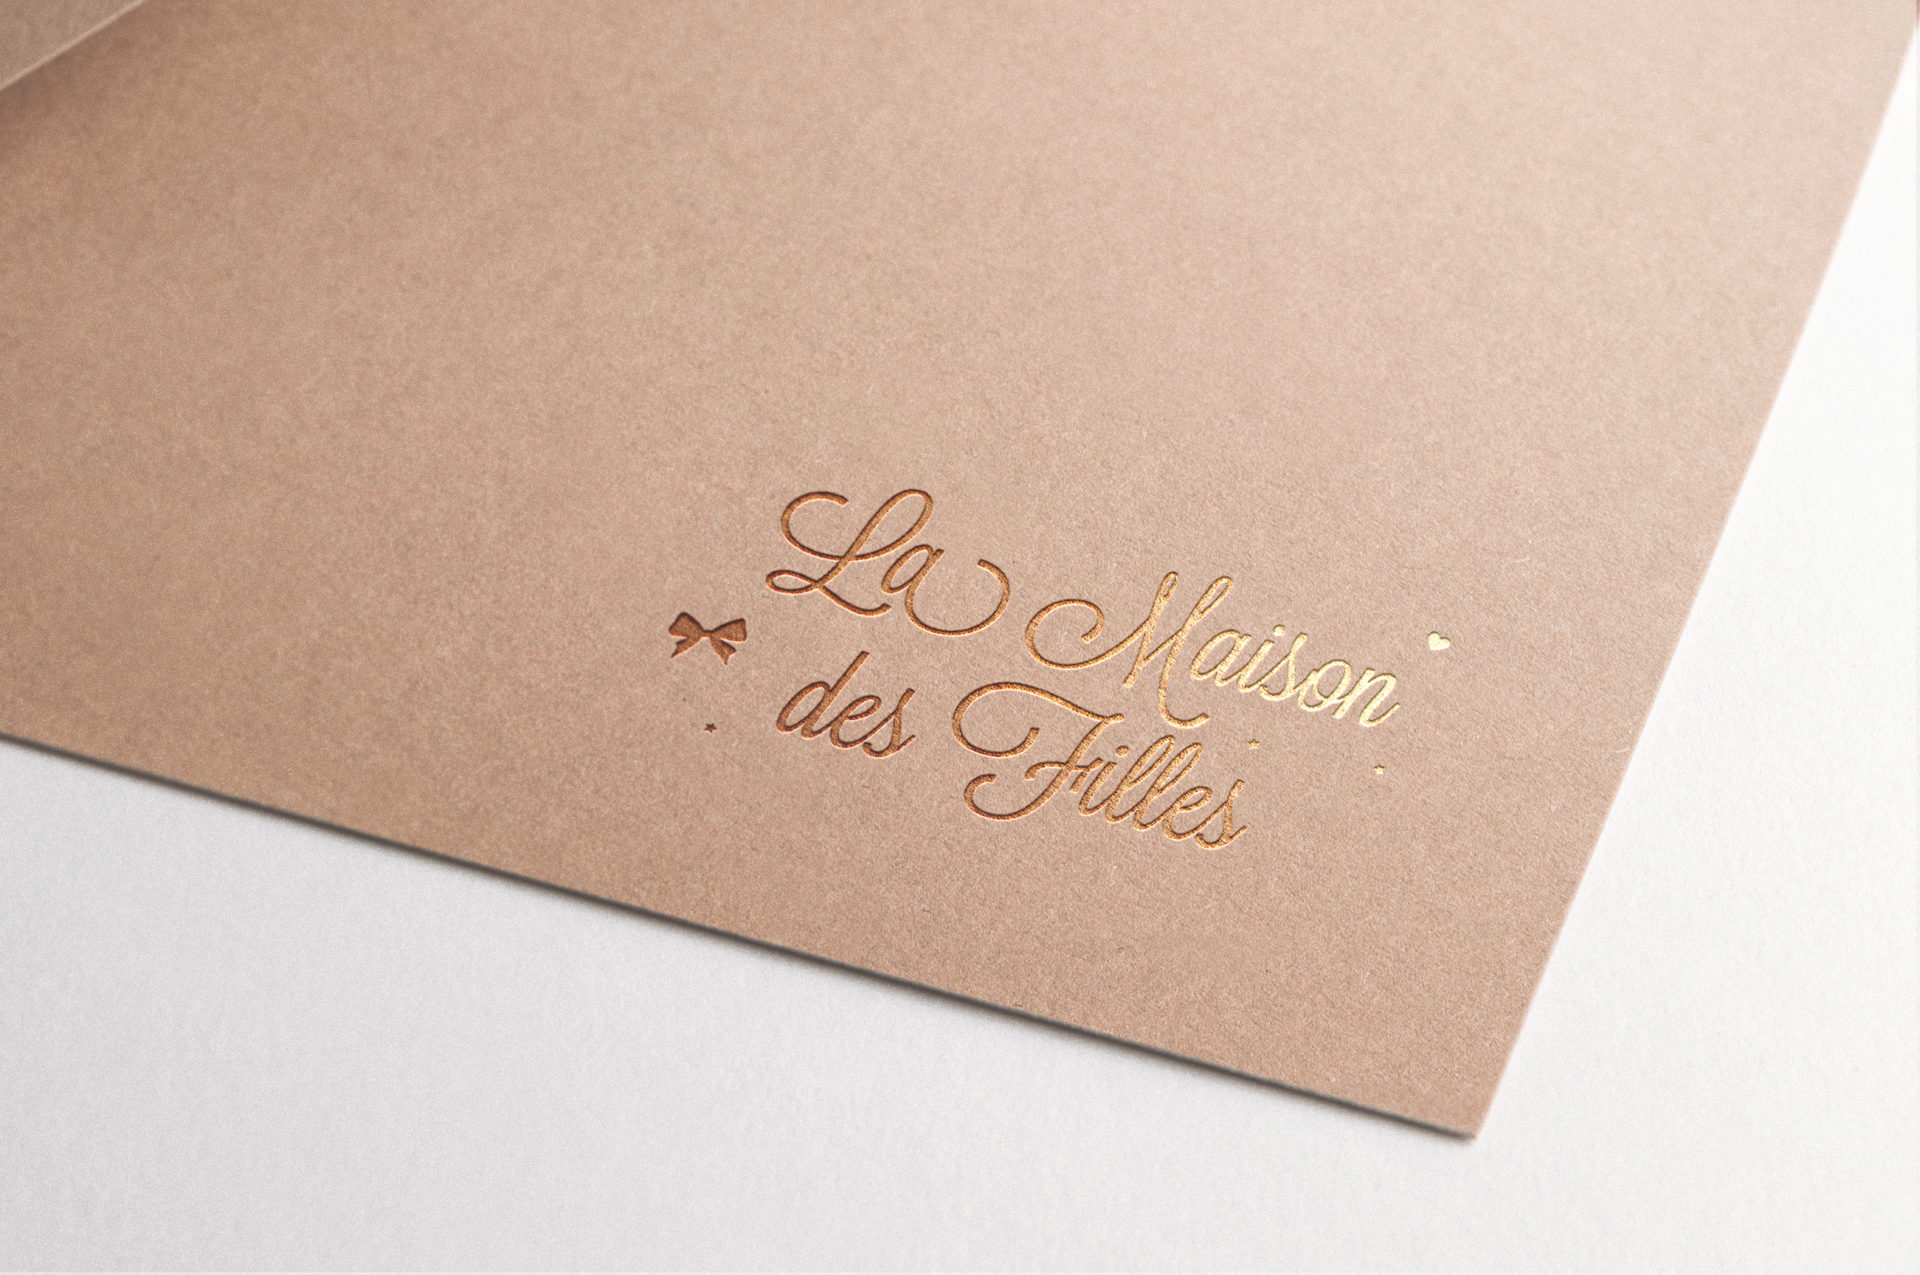 Logo-dore-kraft-feminin-beaute-maison-des-filles